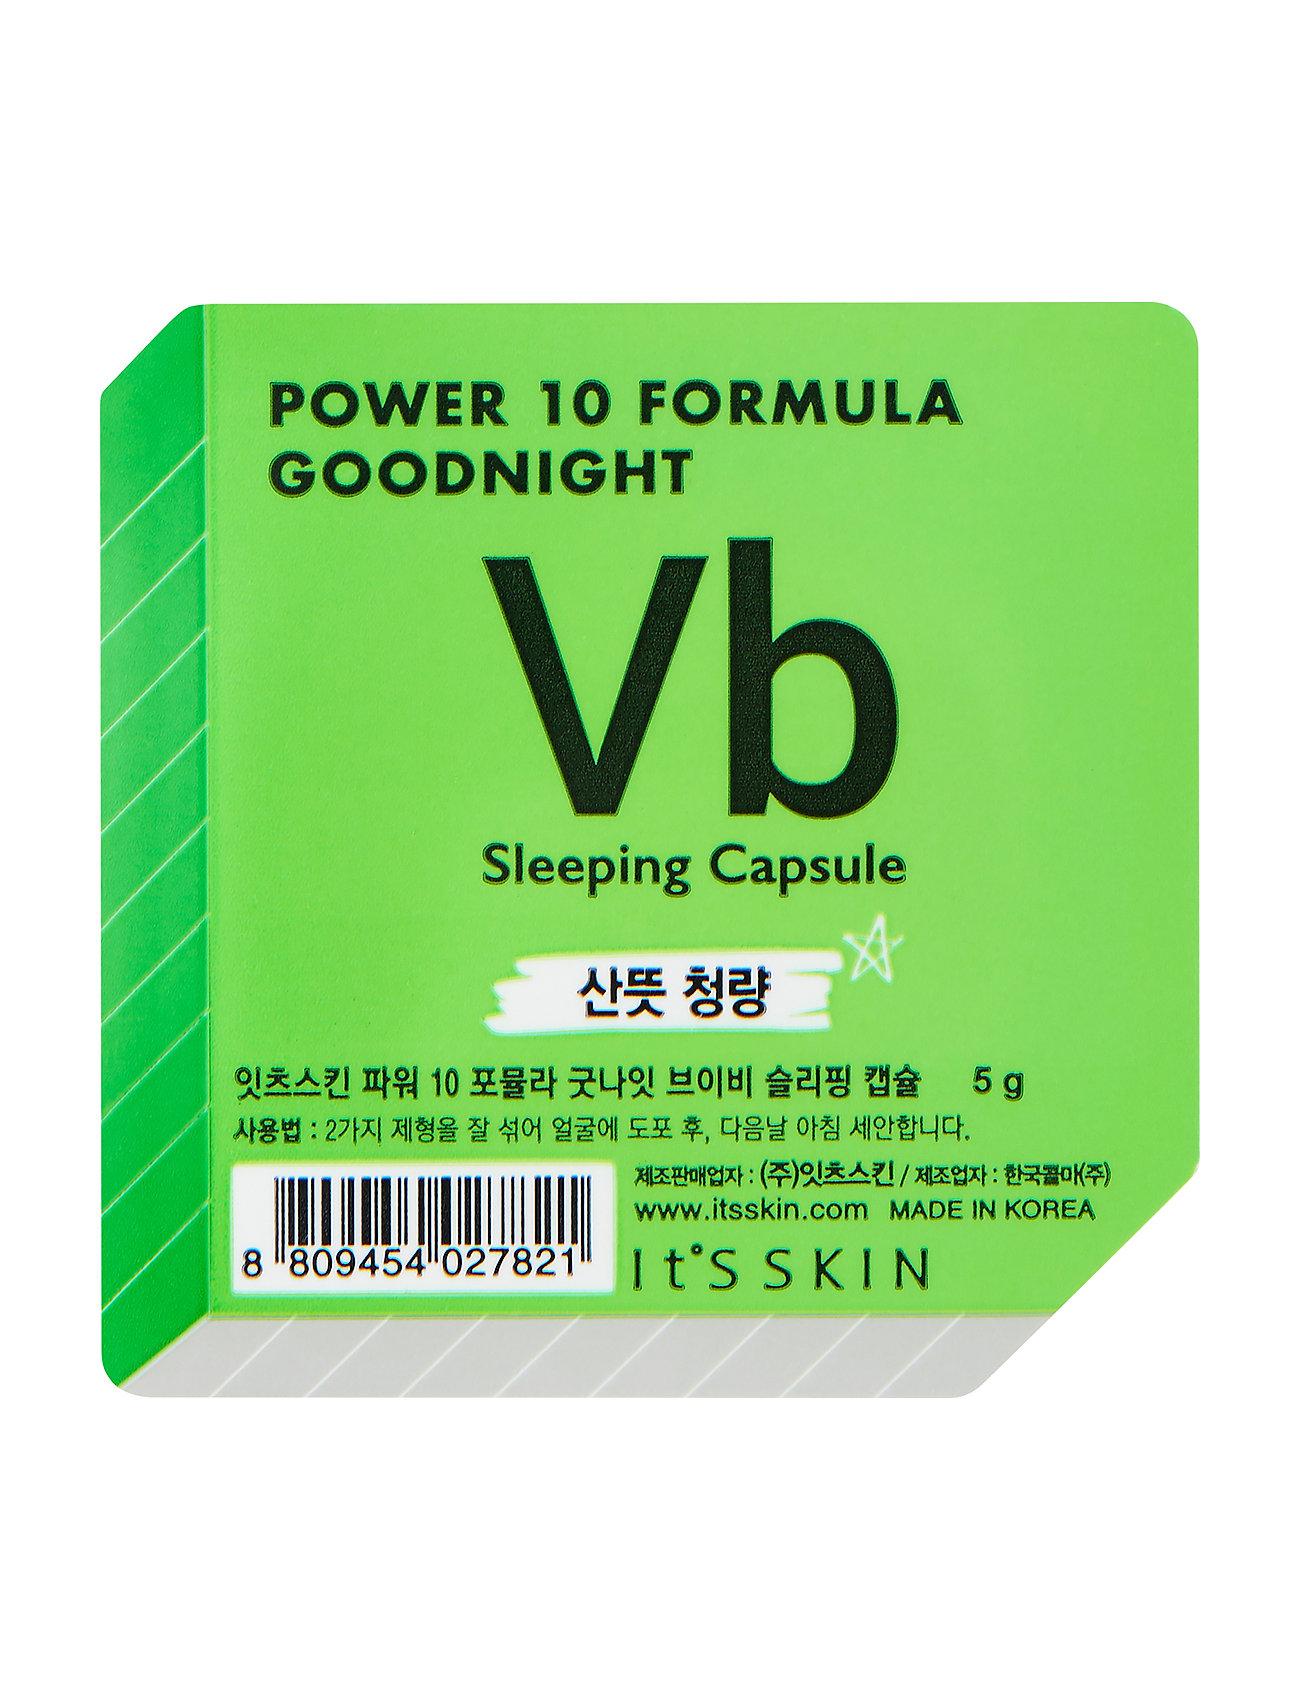 Image of It'S Skin Formula Goodnight Sleeping Capsule Vb Beauty WOMEN Skin Care Face Moisturizers Night Cream Nude It'S SKIN (3158644439)